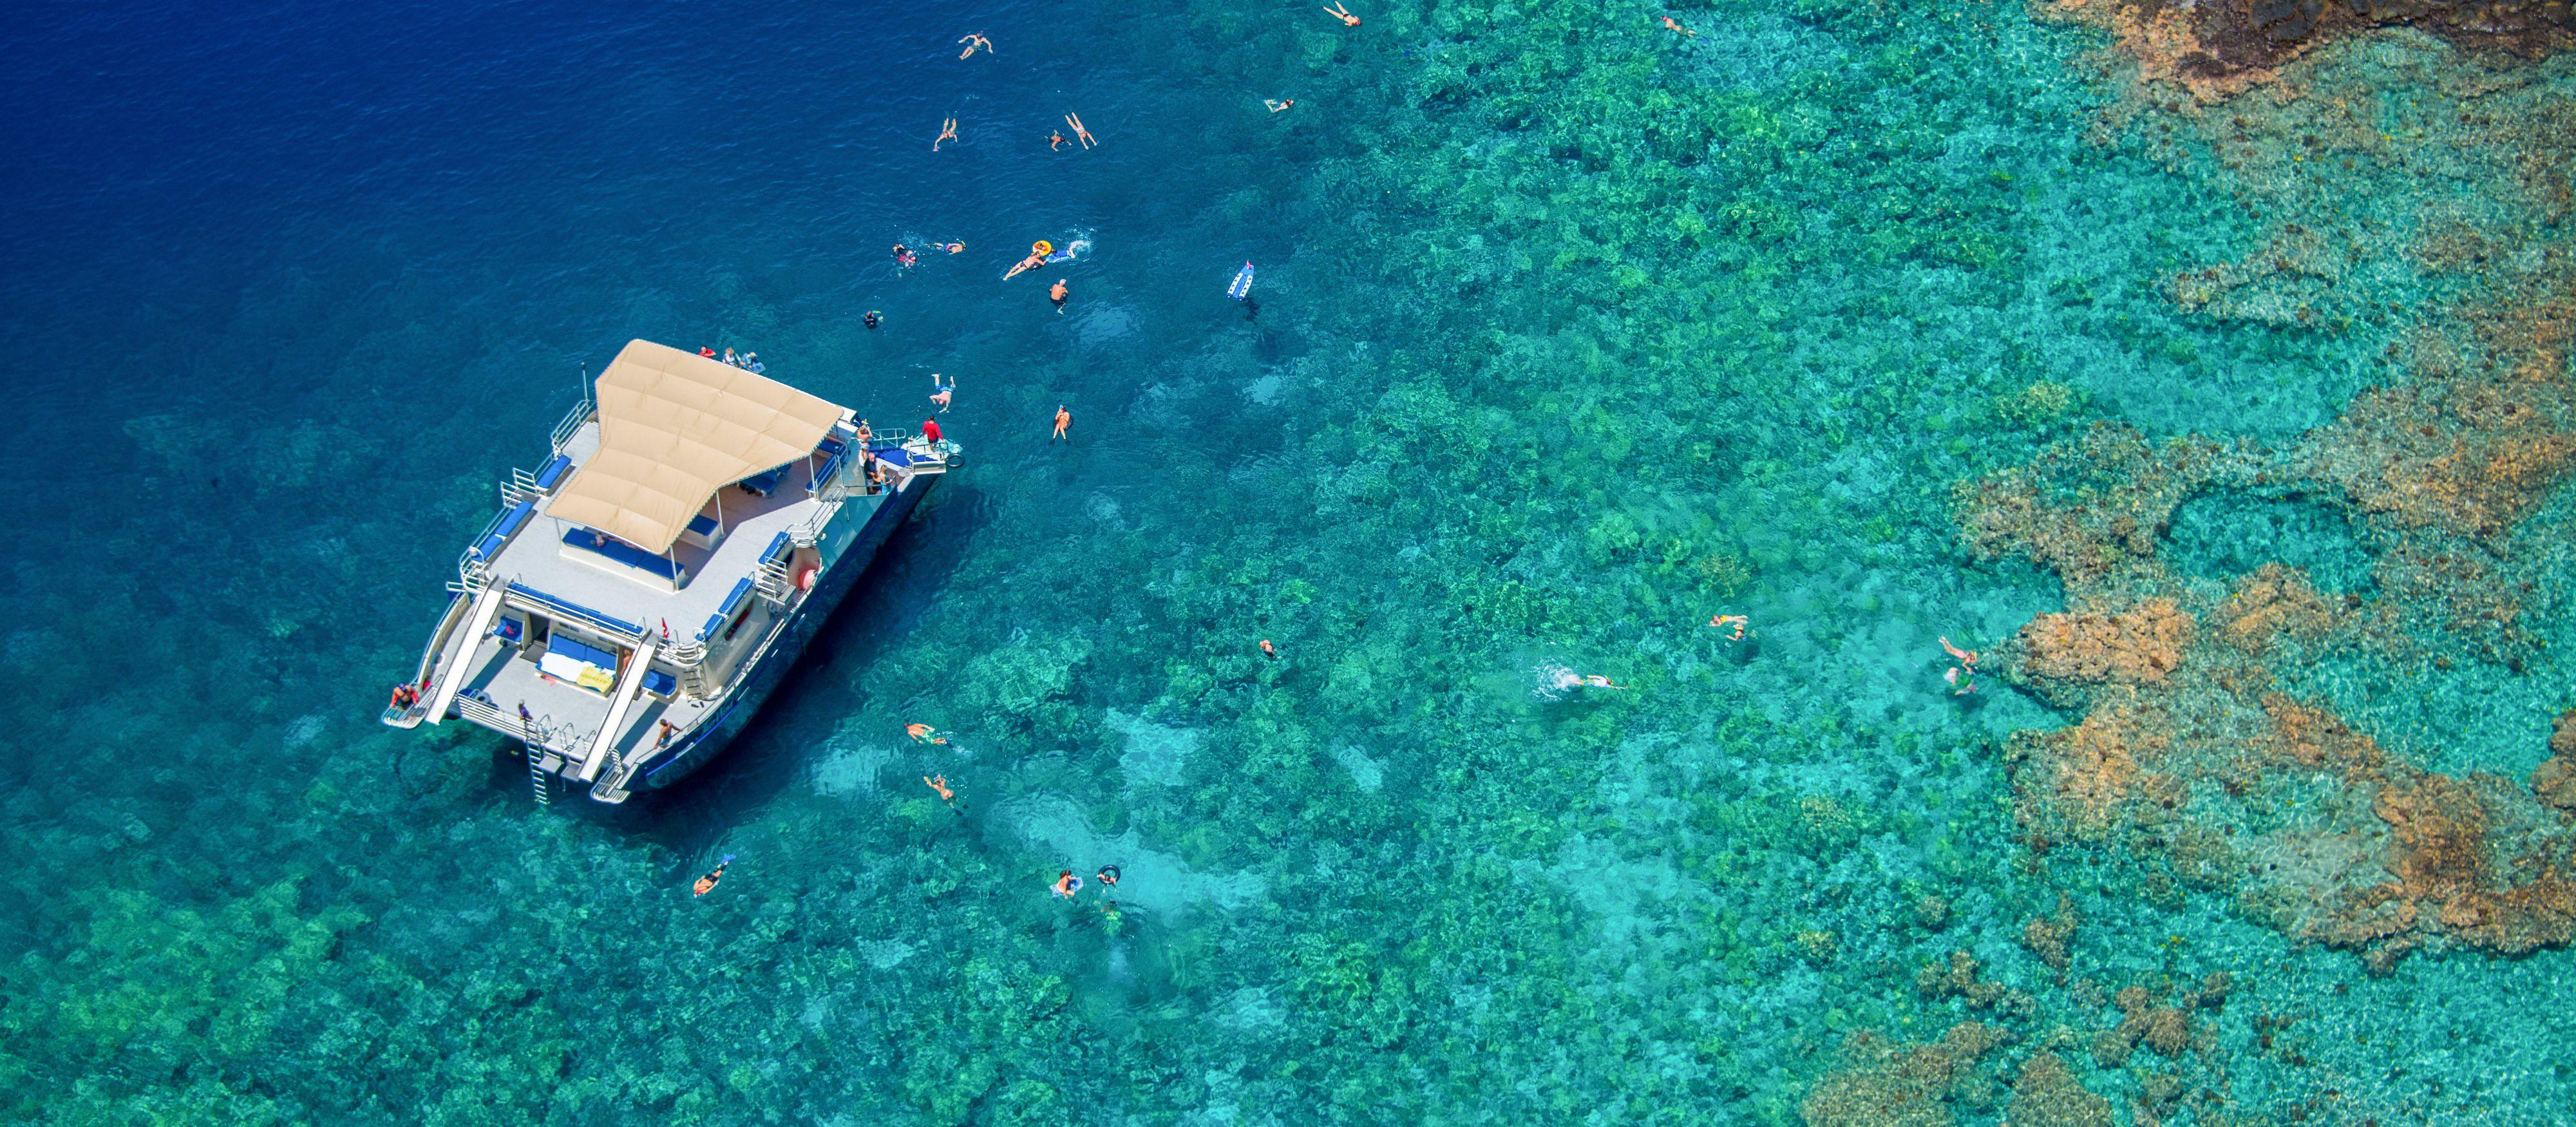 Morning Kealakekua Snorkel & BBQ Cruise mit Fair Wind Cruises auf Hawaii